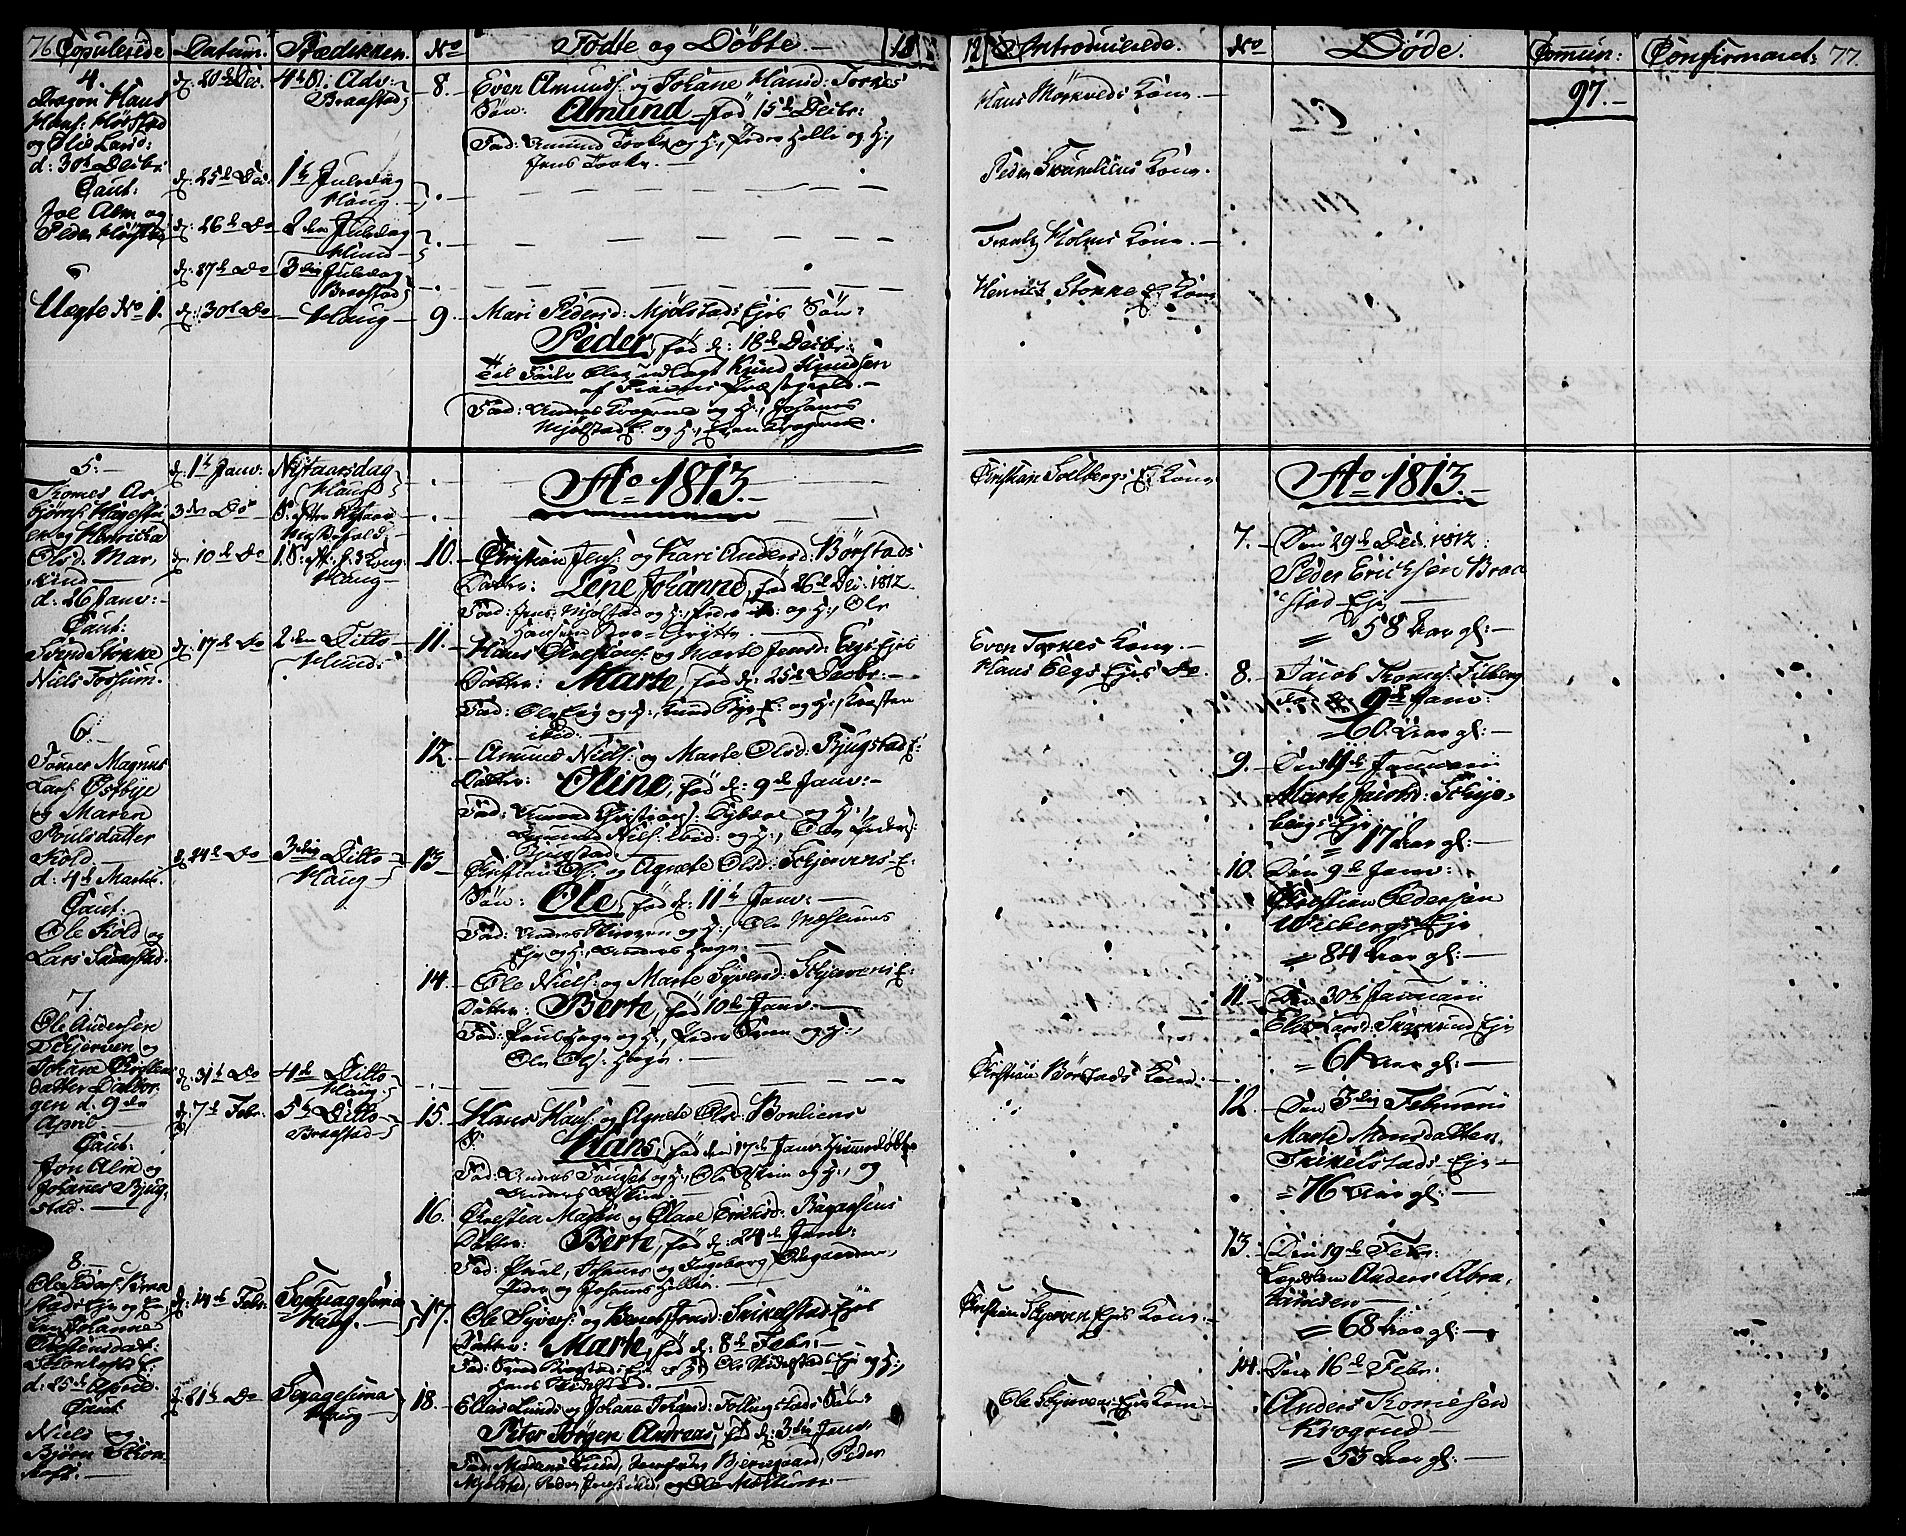 SAH, Vardal prestekontor, H/Ha/Haa/L0003: Ministerialbok nr. 3, 1808-1814, s. 76-77